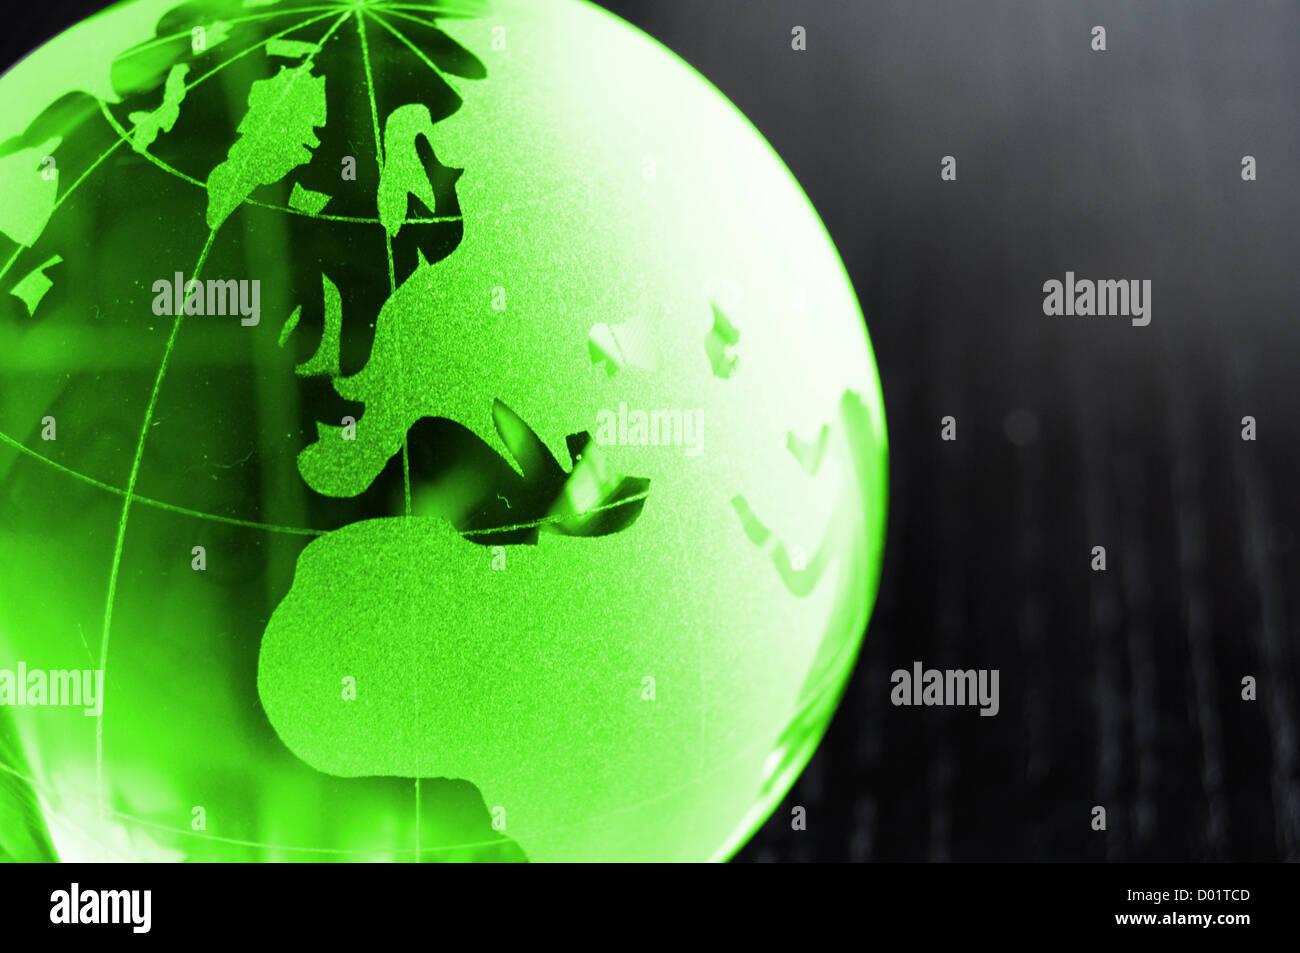 globales Geschäft oder Eco Konzept mit schwarzen Exemplar Stockbild